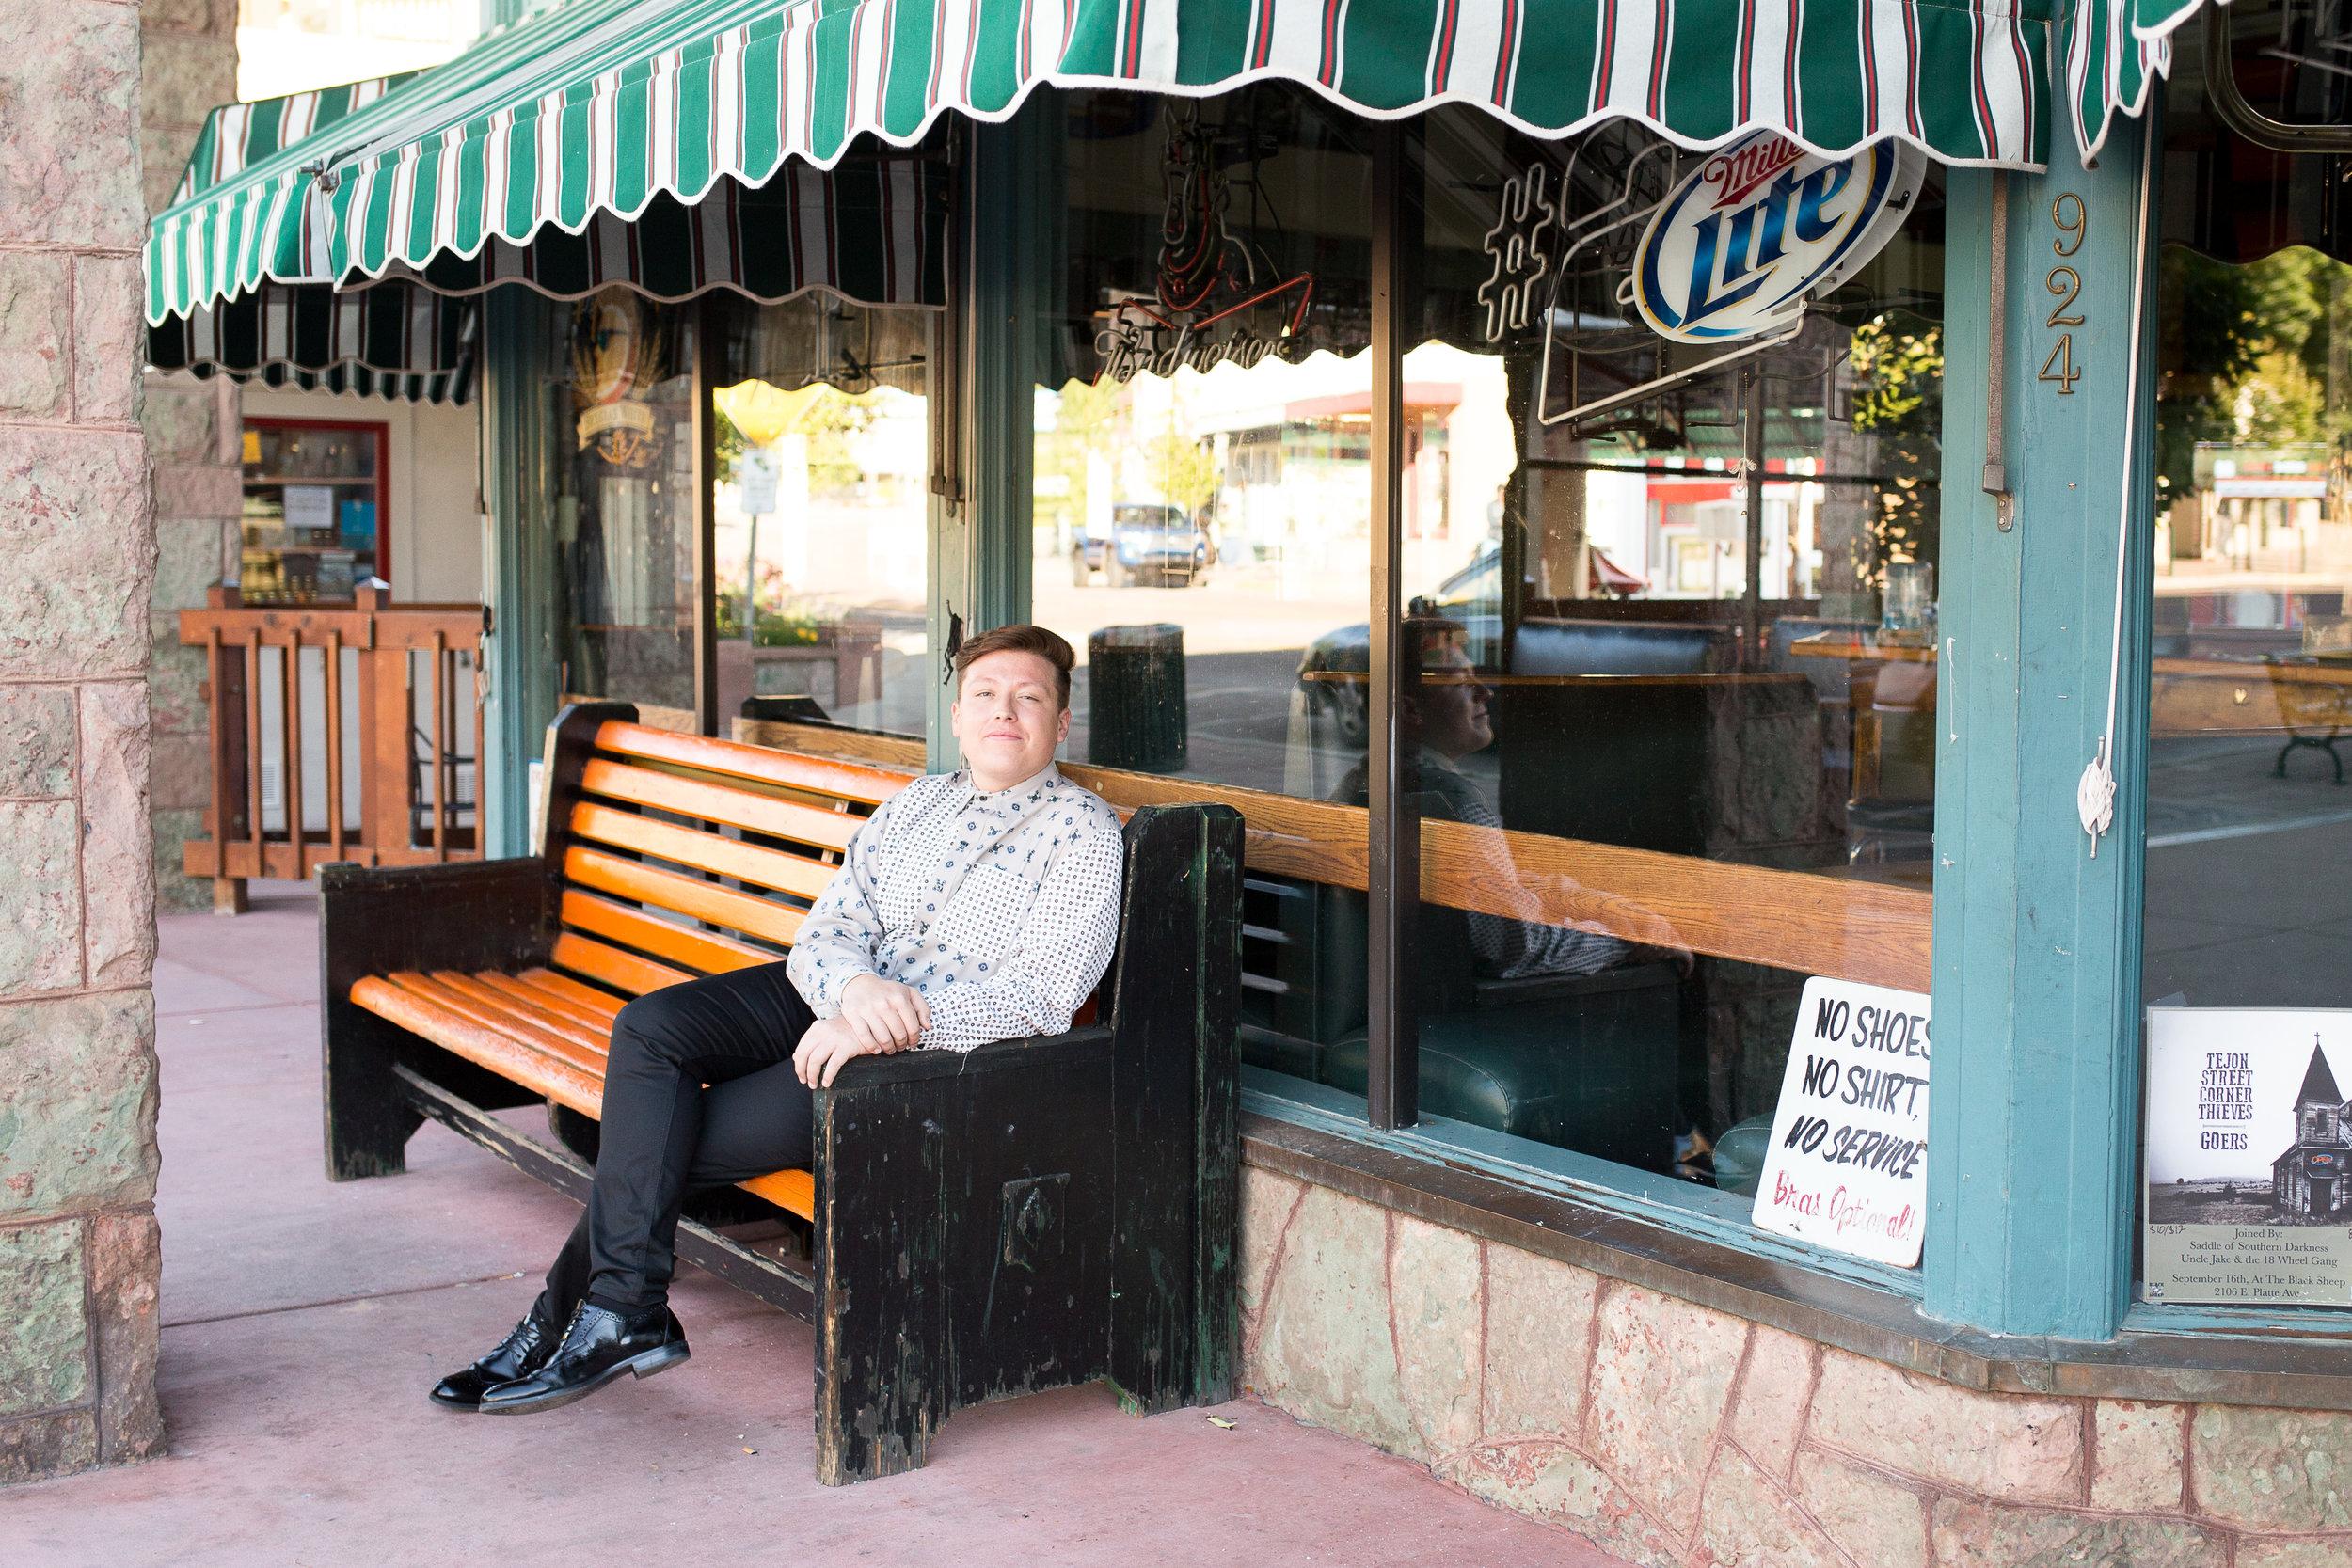 Colorado Springs Senior Portraits | Manitou Springs Senior Photography | Colorado Springs Senior Photographer | Stacy Carosa Photography